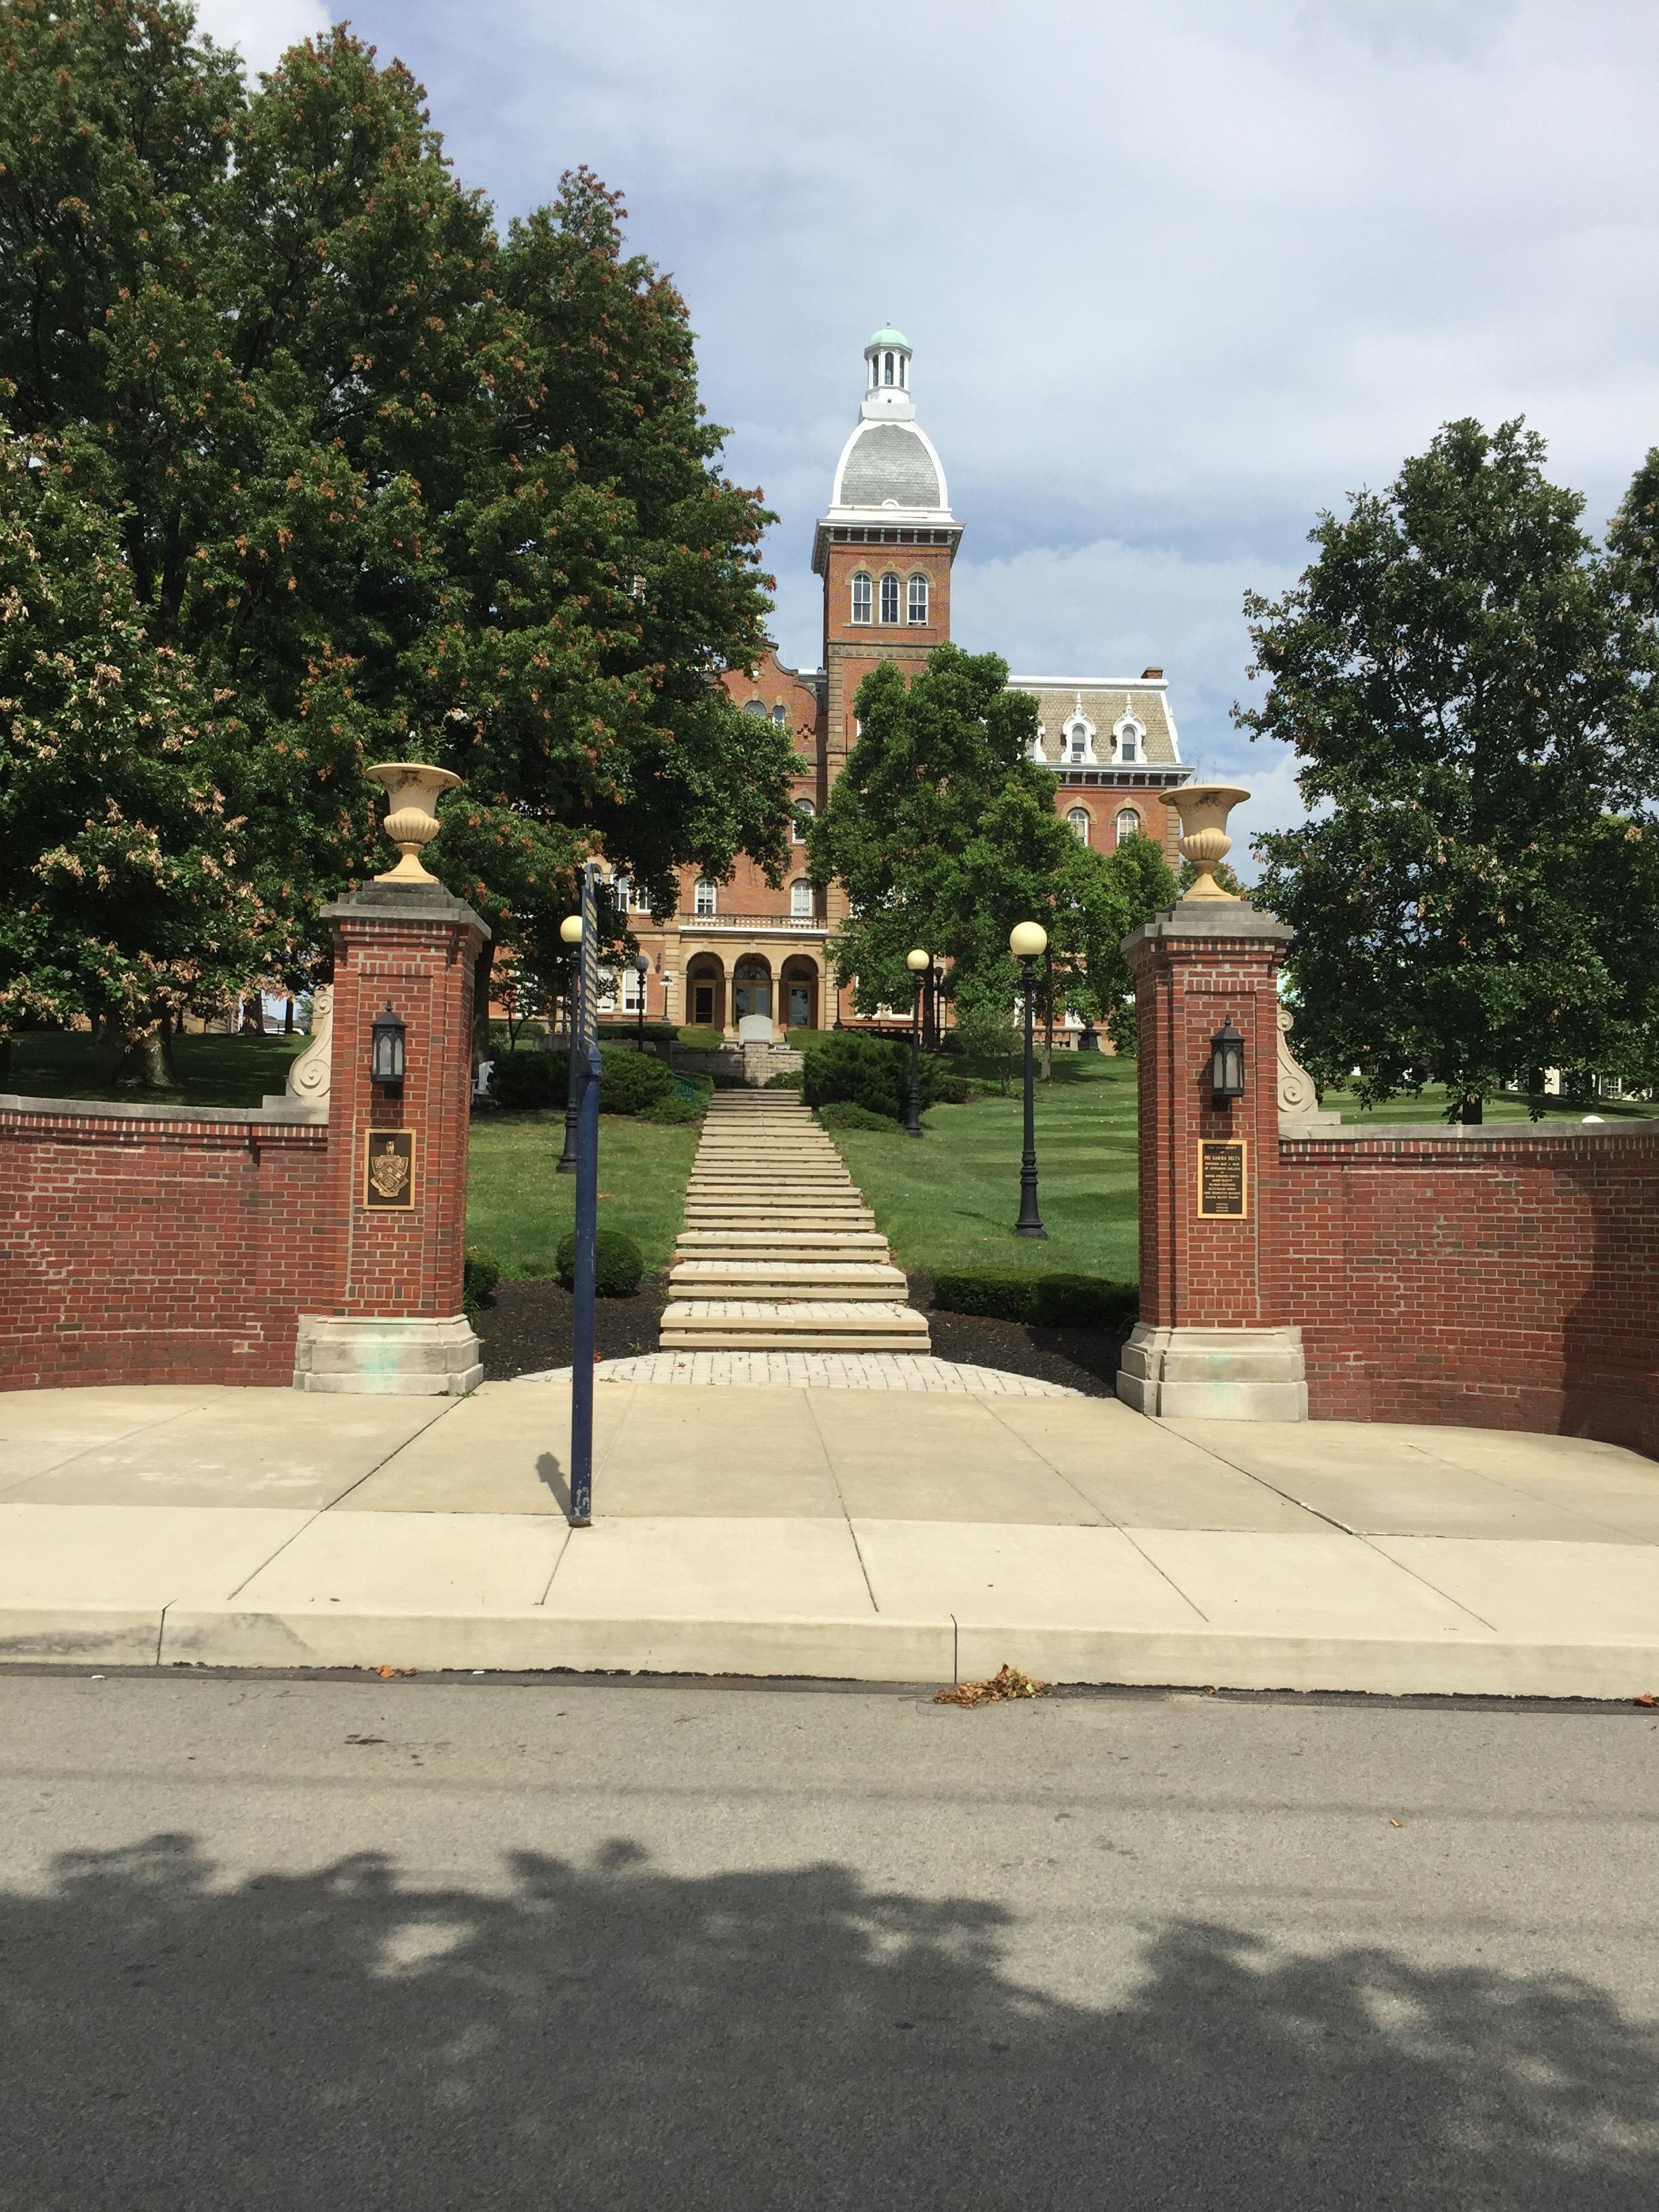 Old Main, Washington and Jefferson College, Washington, Pa.